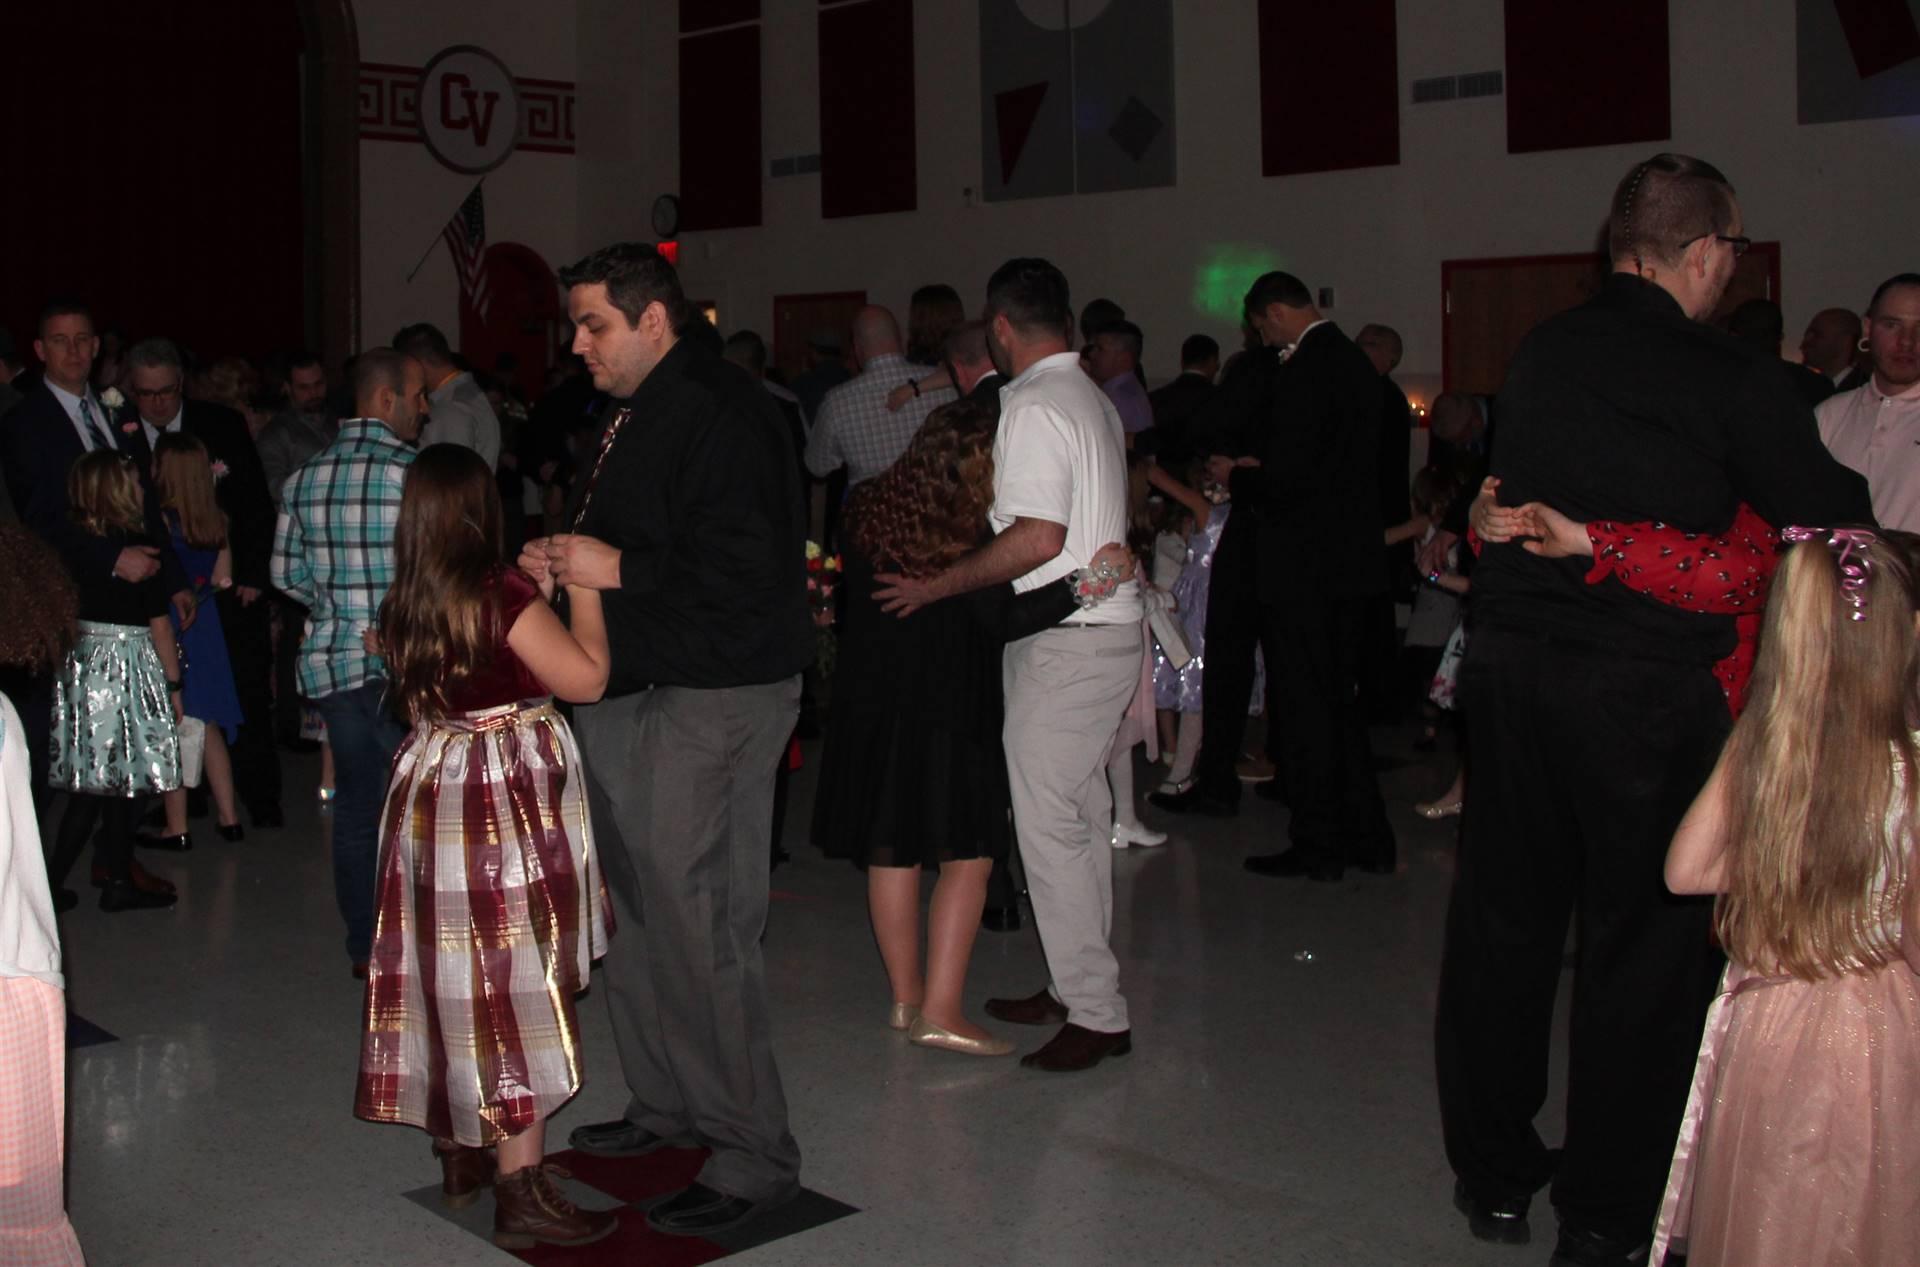 wide shot of people dancing